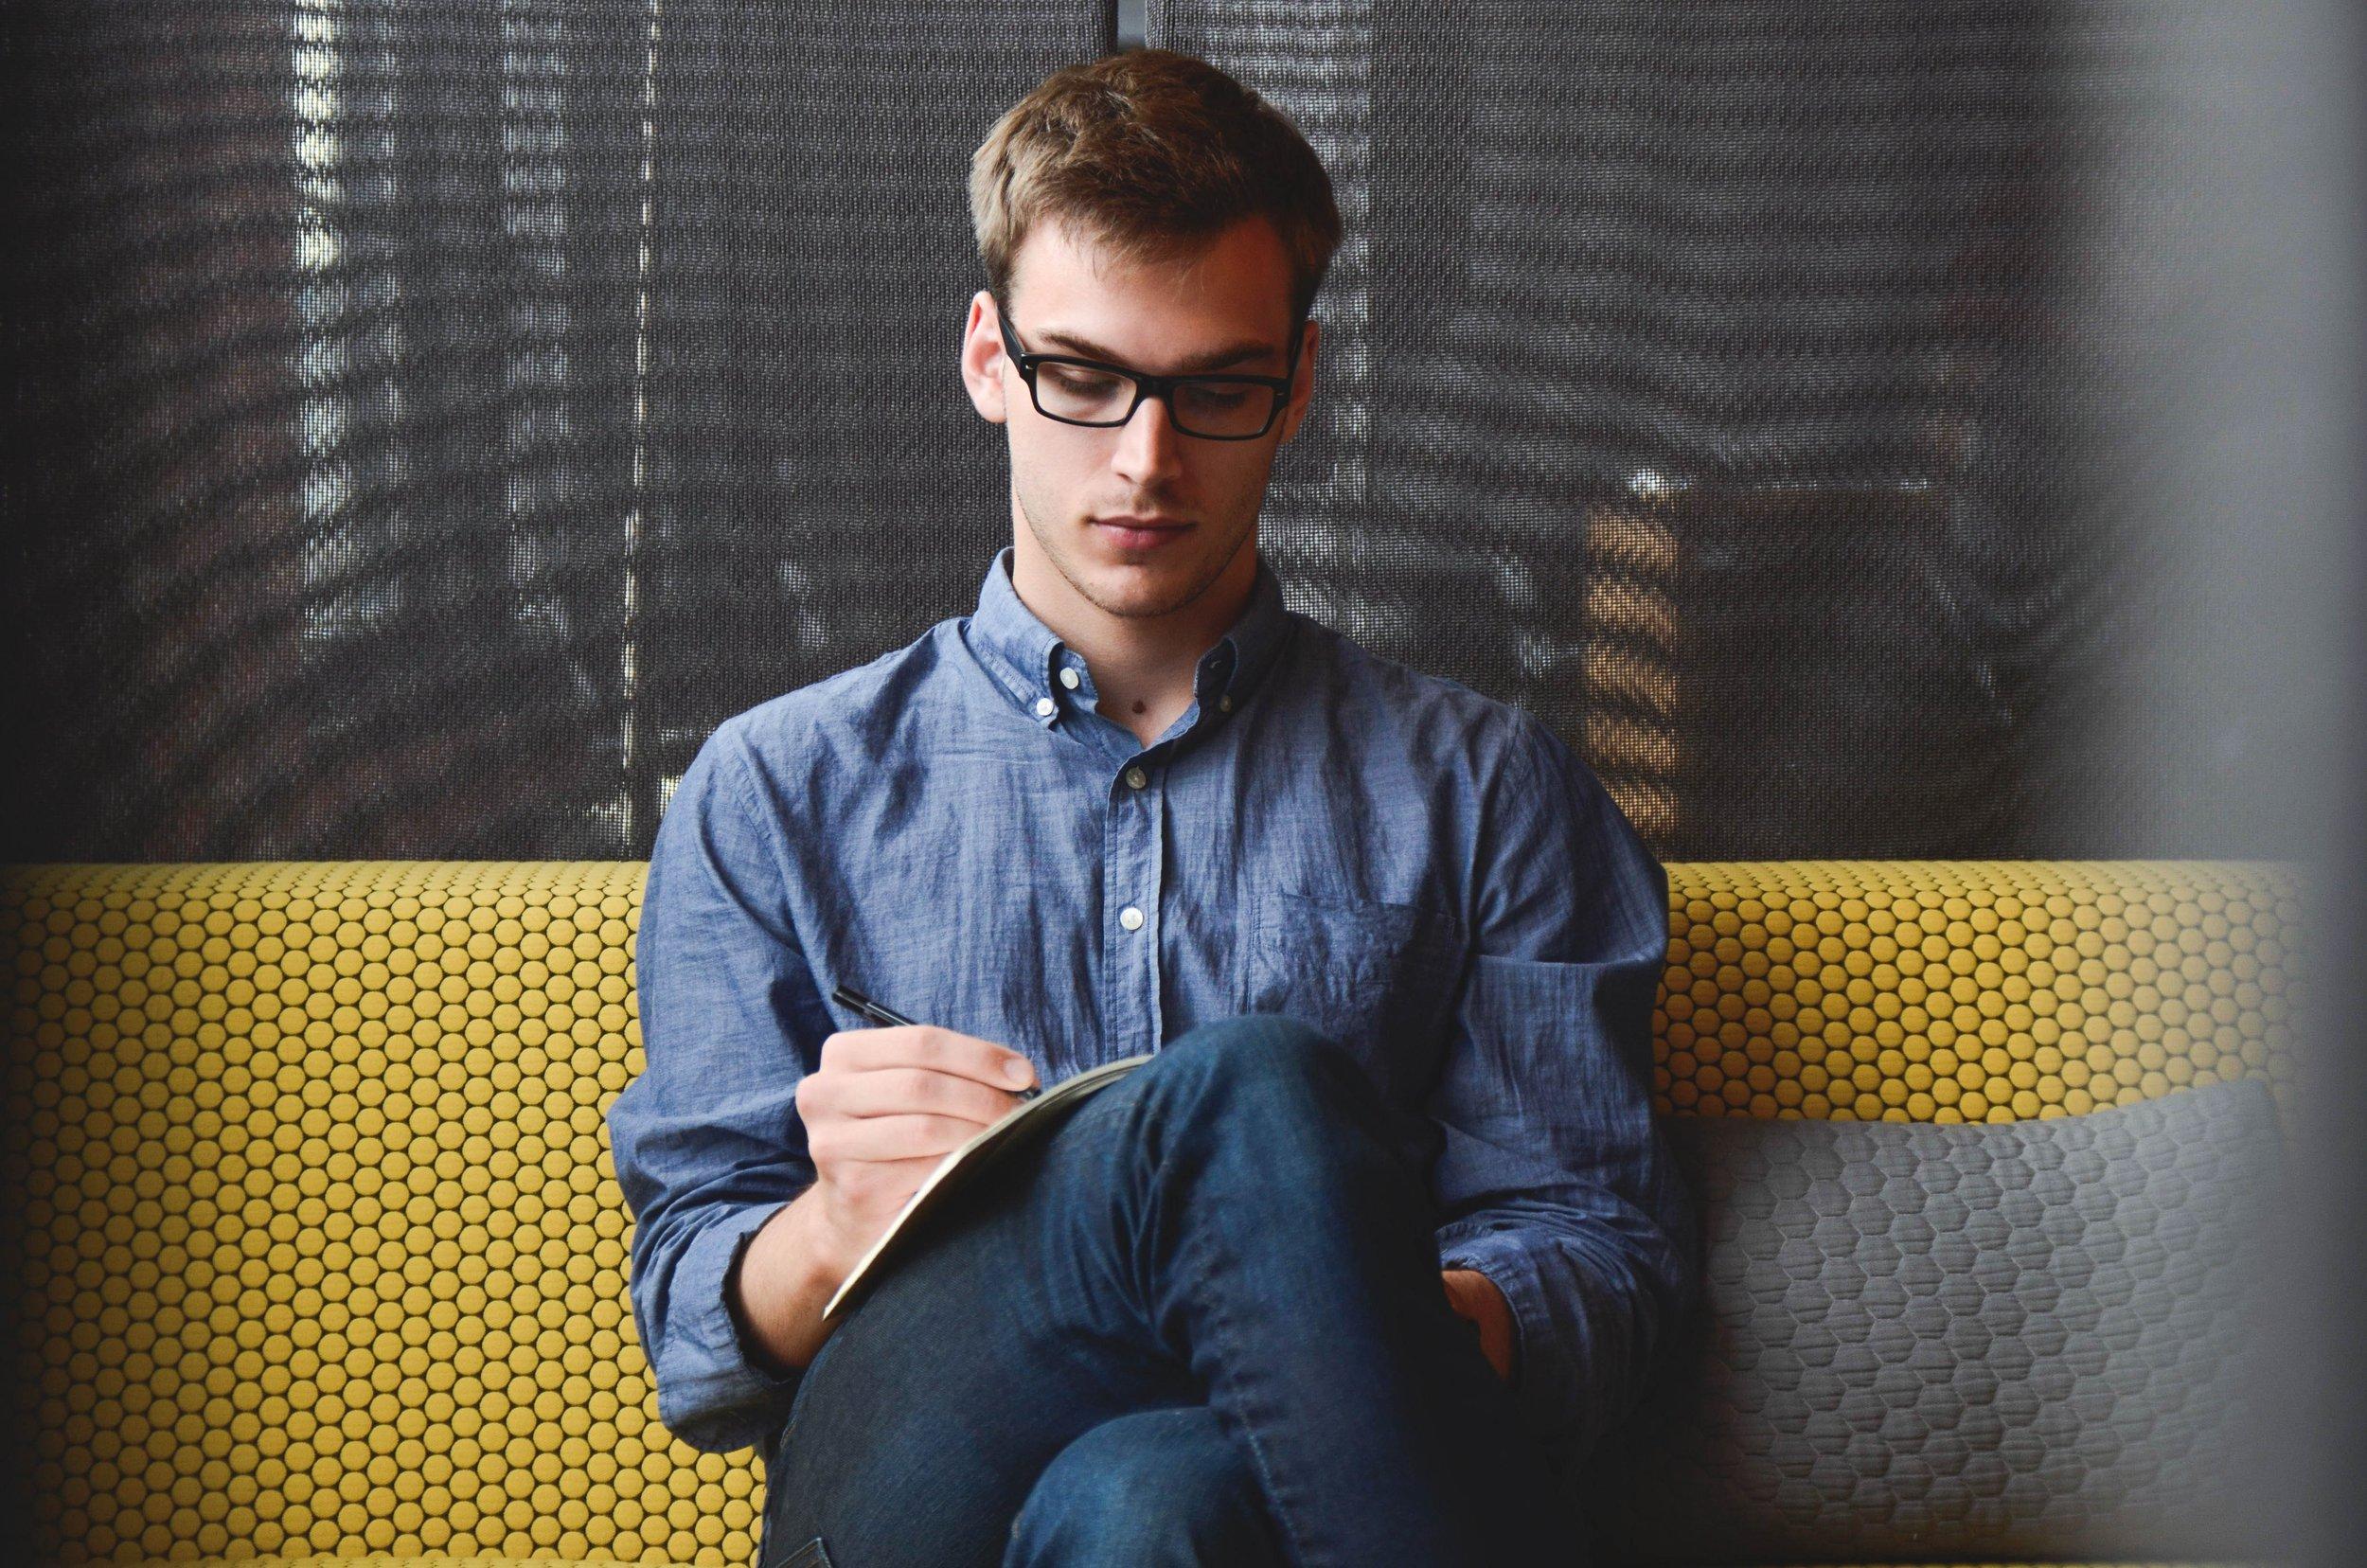 entrepreneur-startup-start-up-man-39866.jpeg